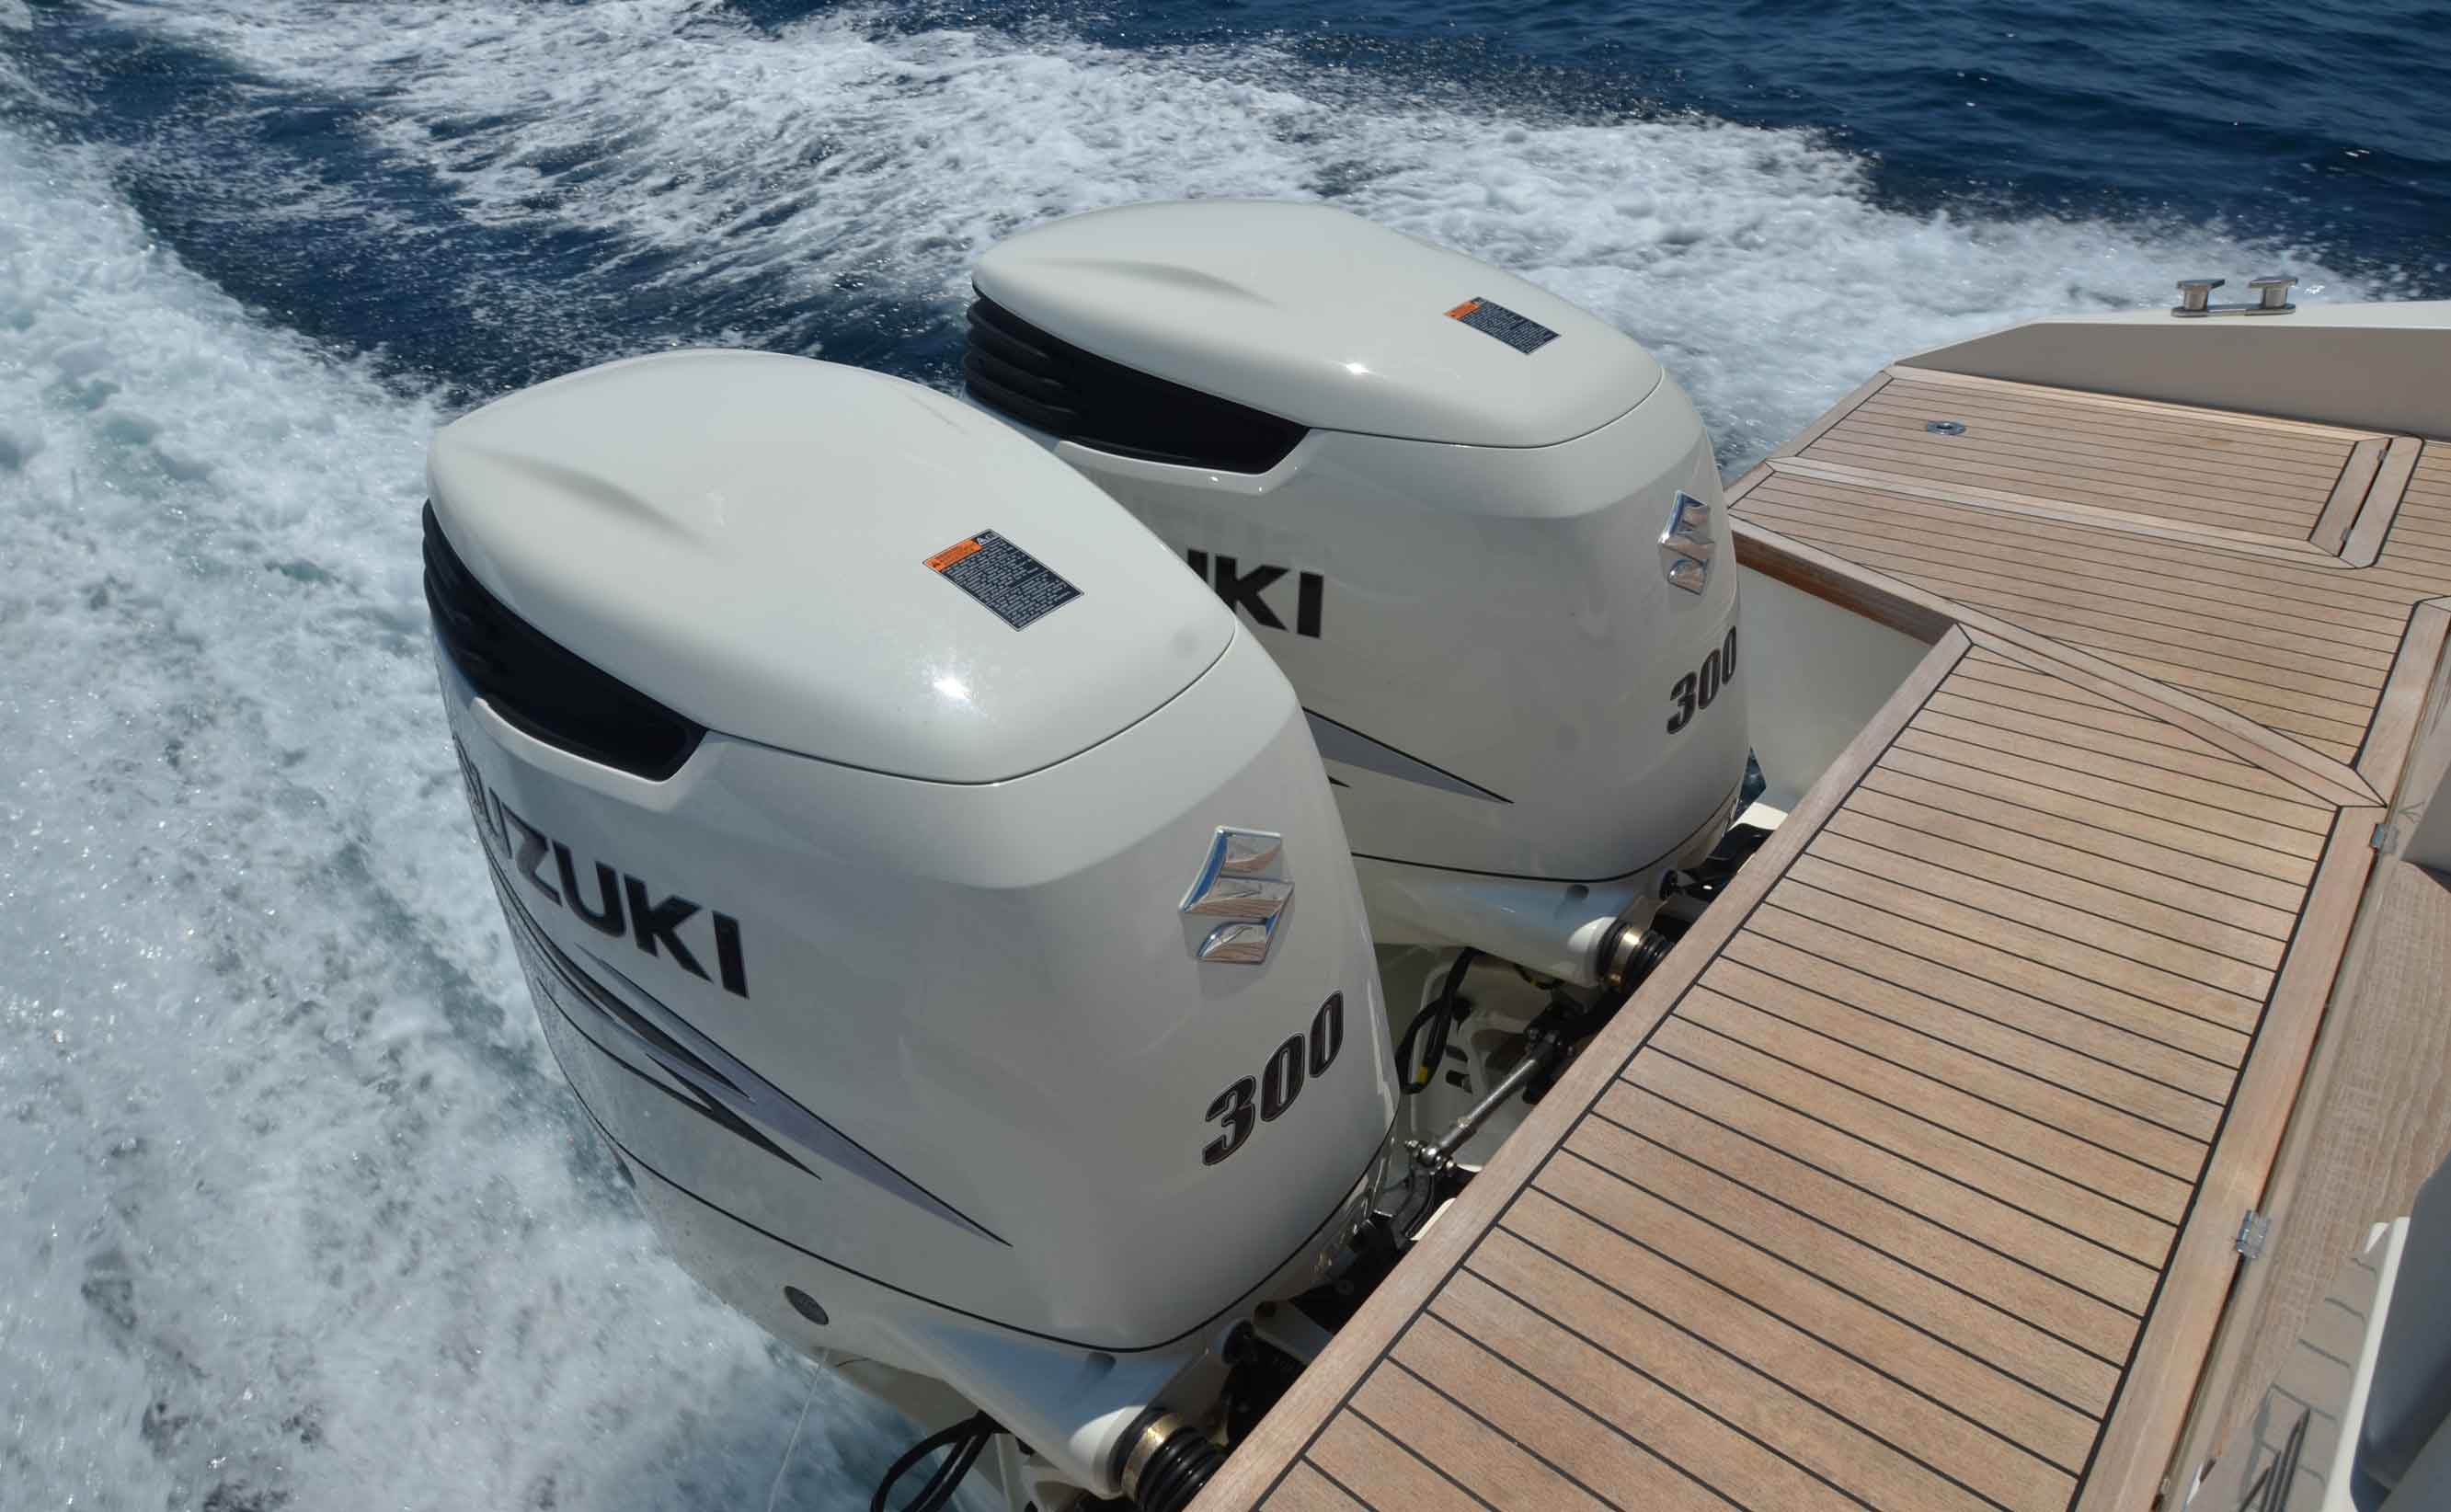 Fiart 33 Seawalker Suzuki DF300